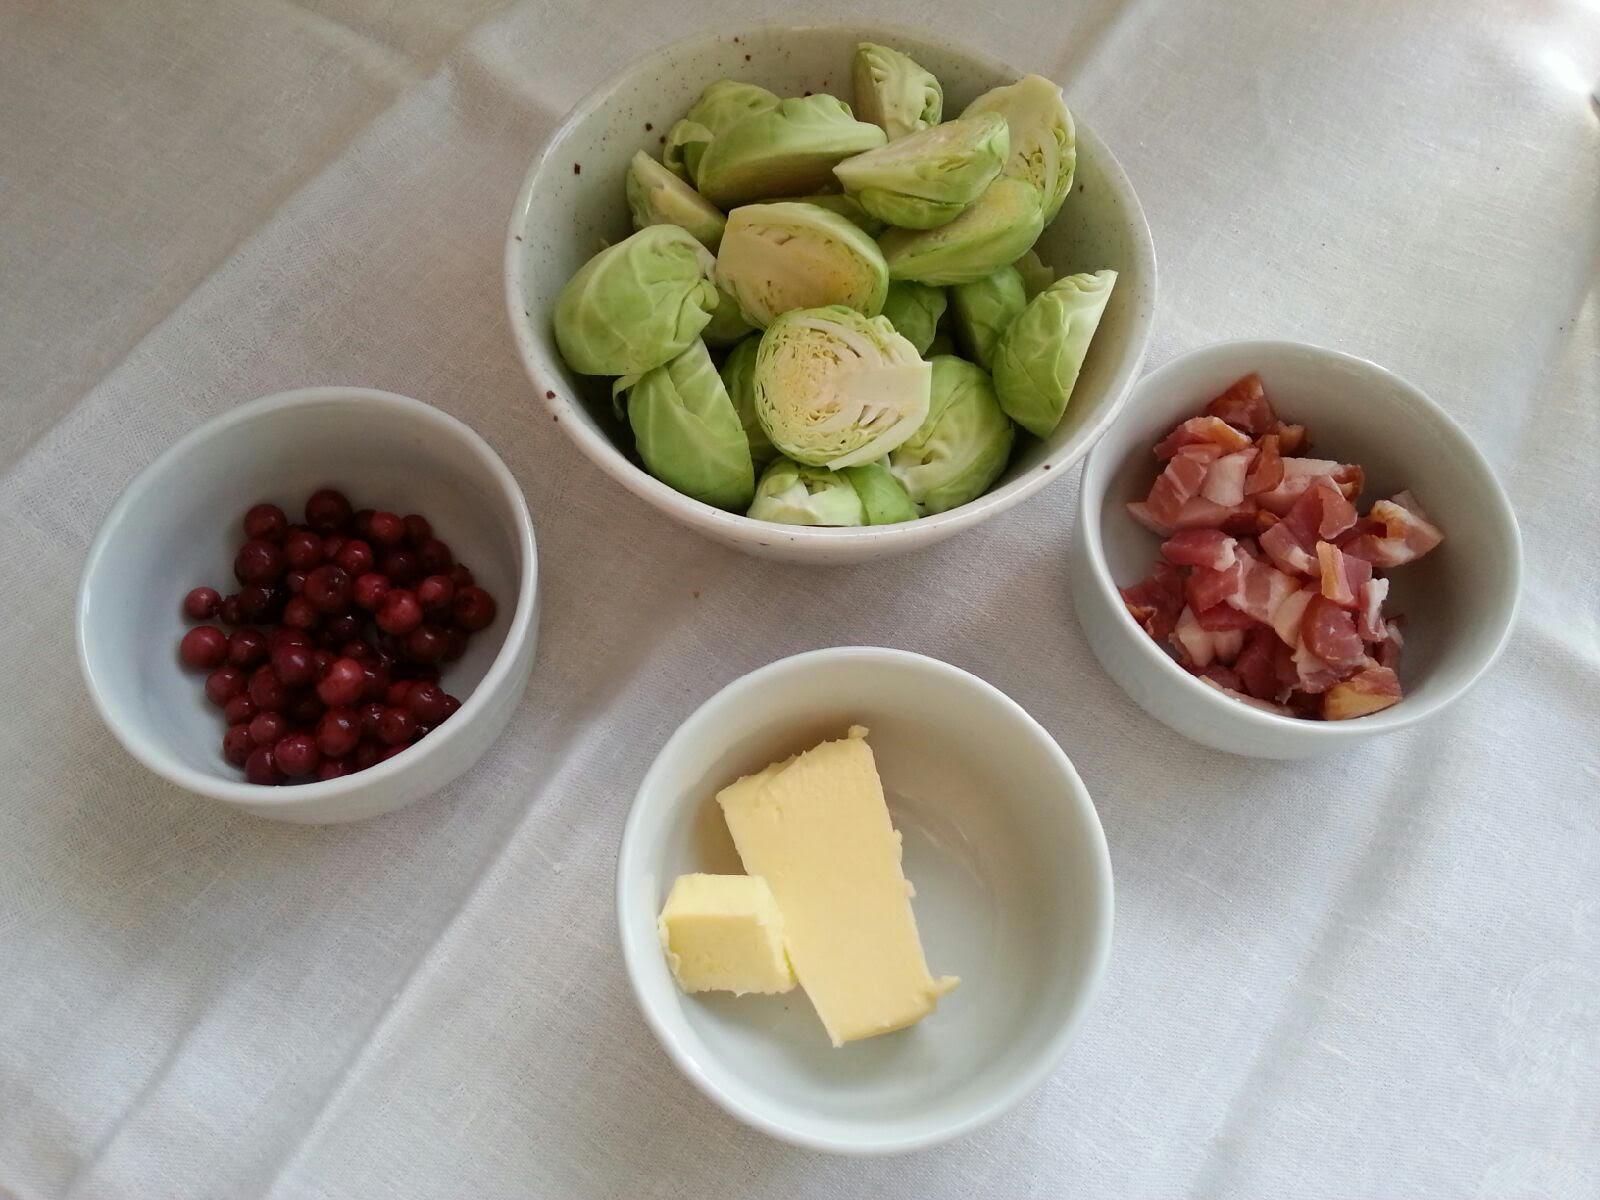 IngredienserReinsdyrMørbrad1